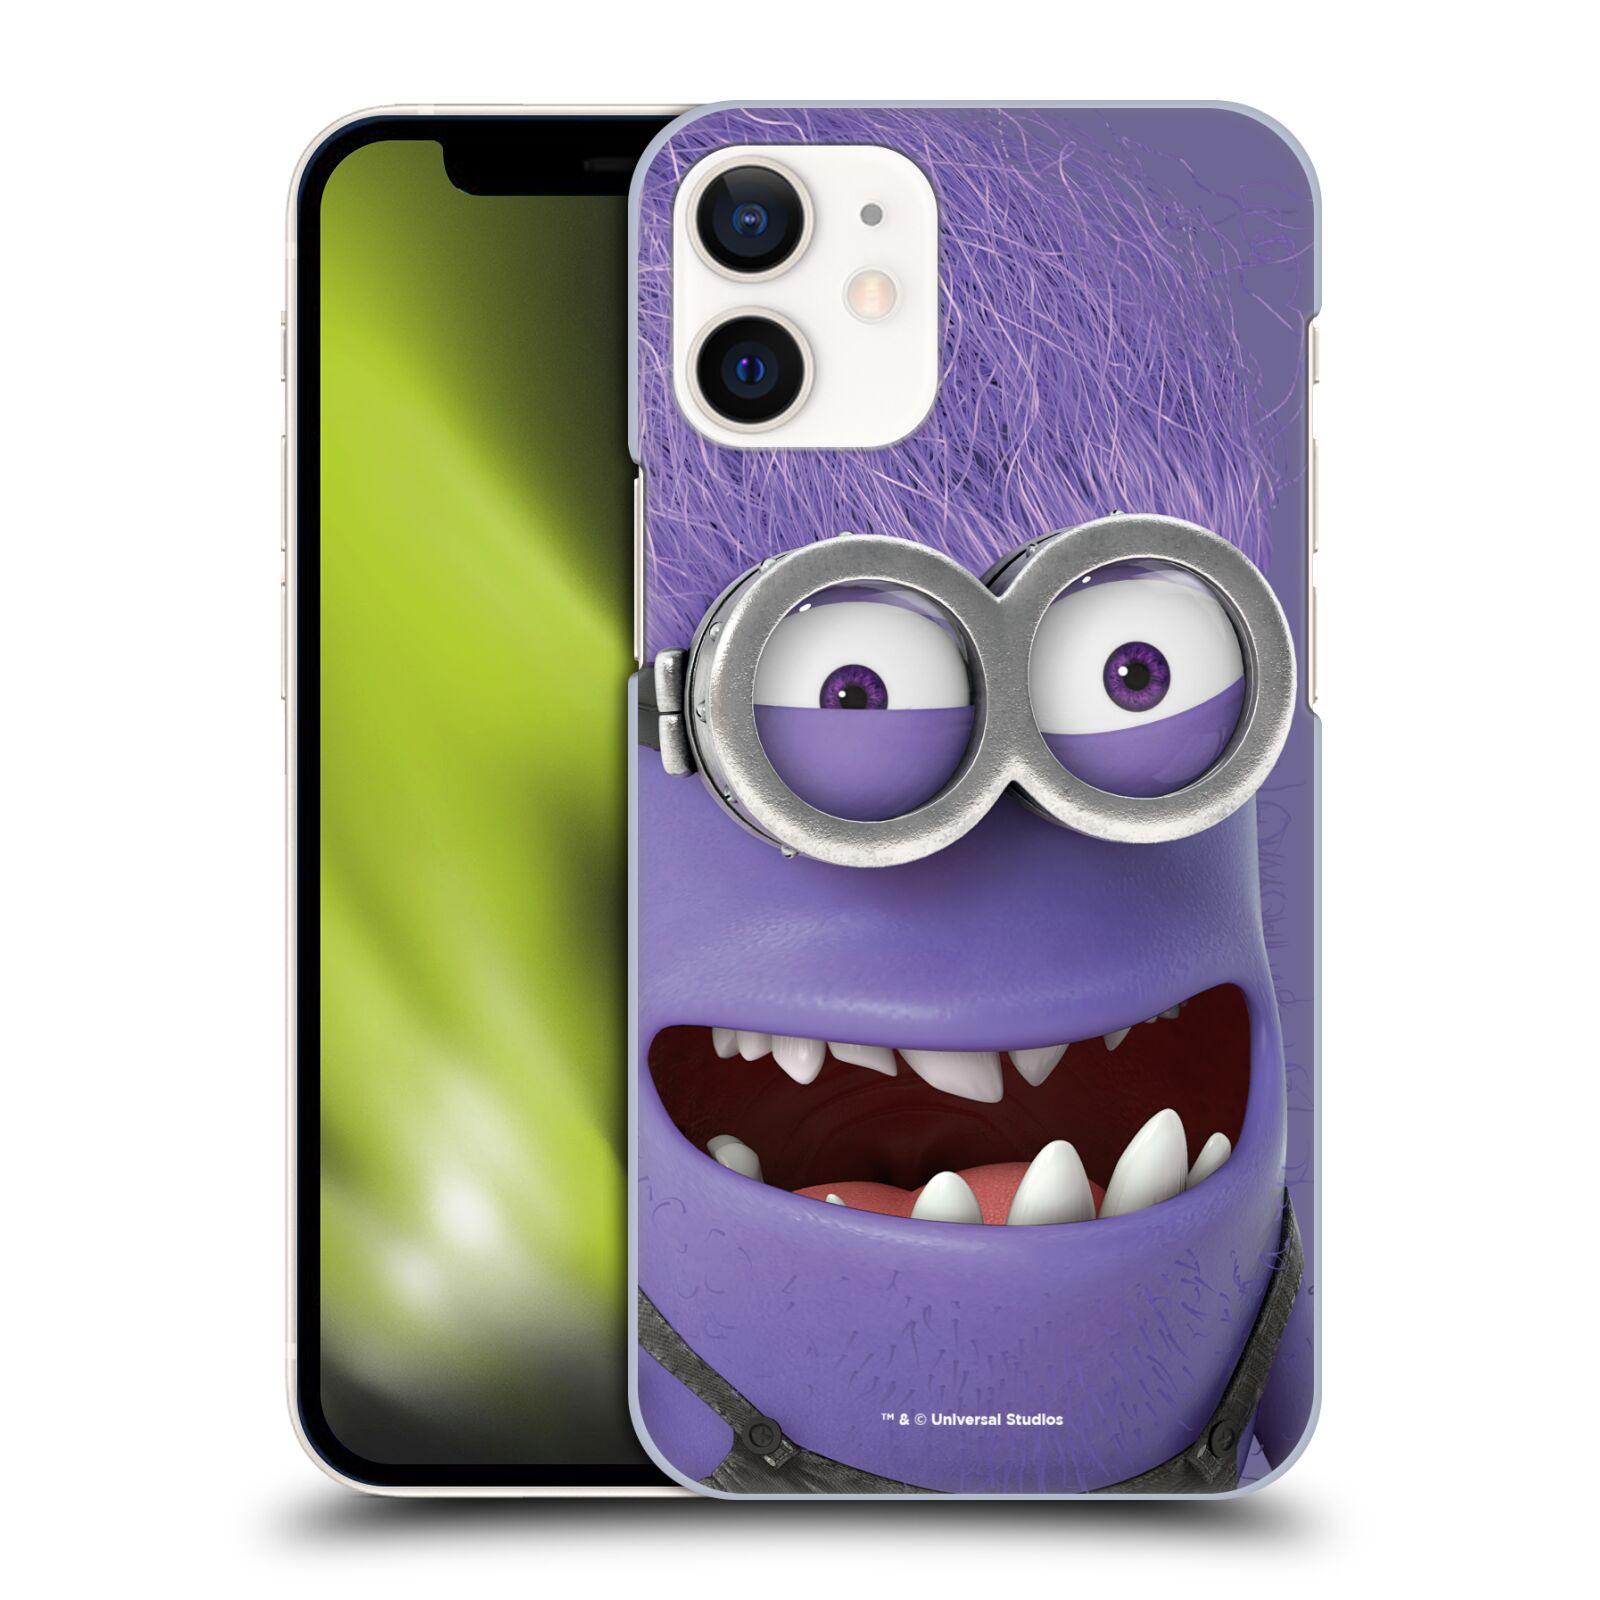 Plastové pouzdro na mobil Apple iPhone 12 Mini - Head Case - Zlý Mimoň z filmu Já, padouch - Despicable Me